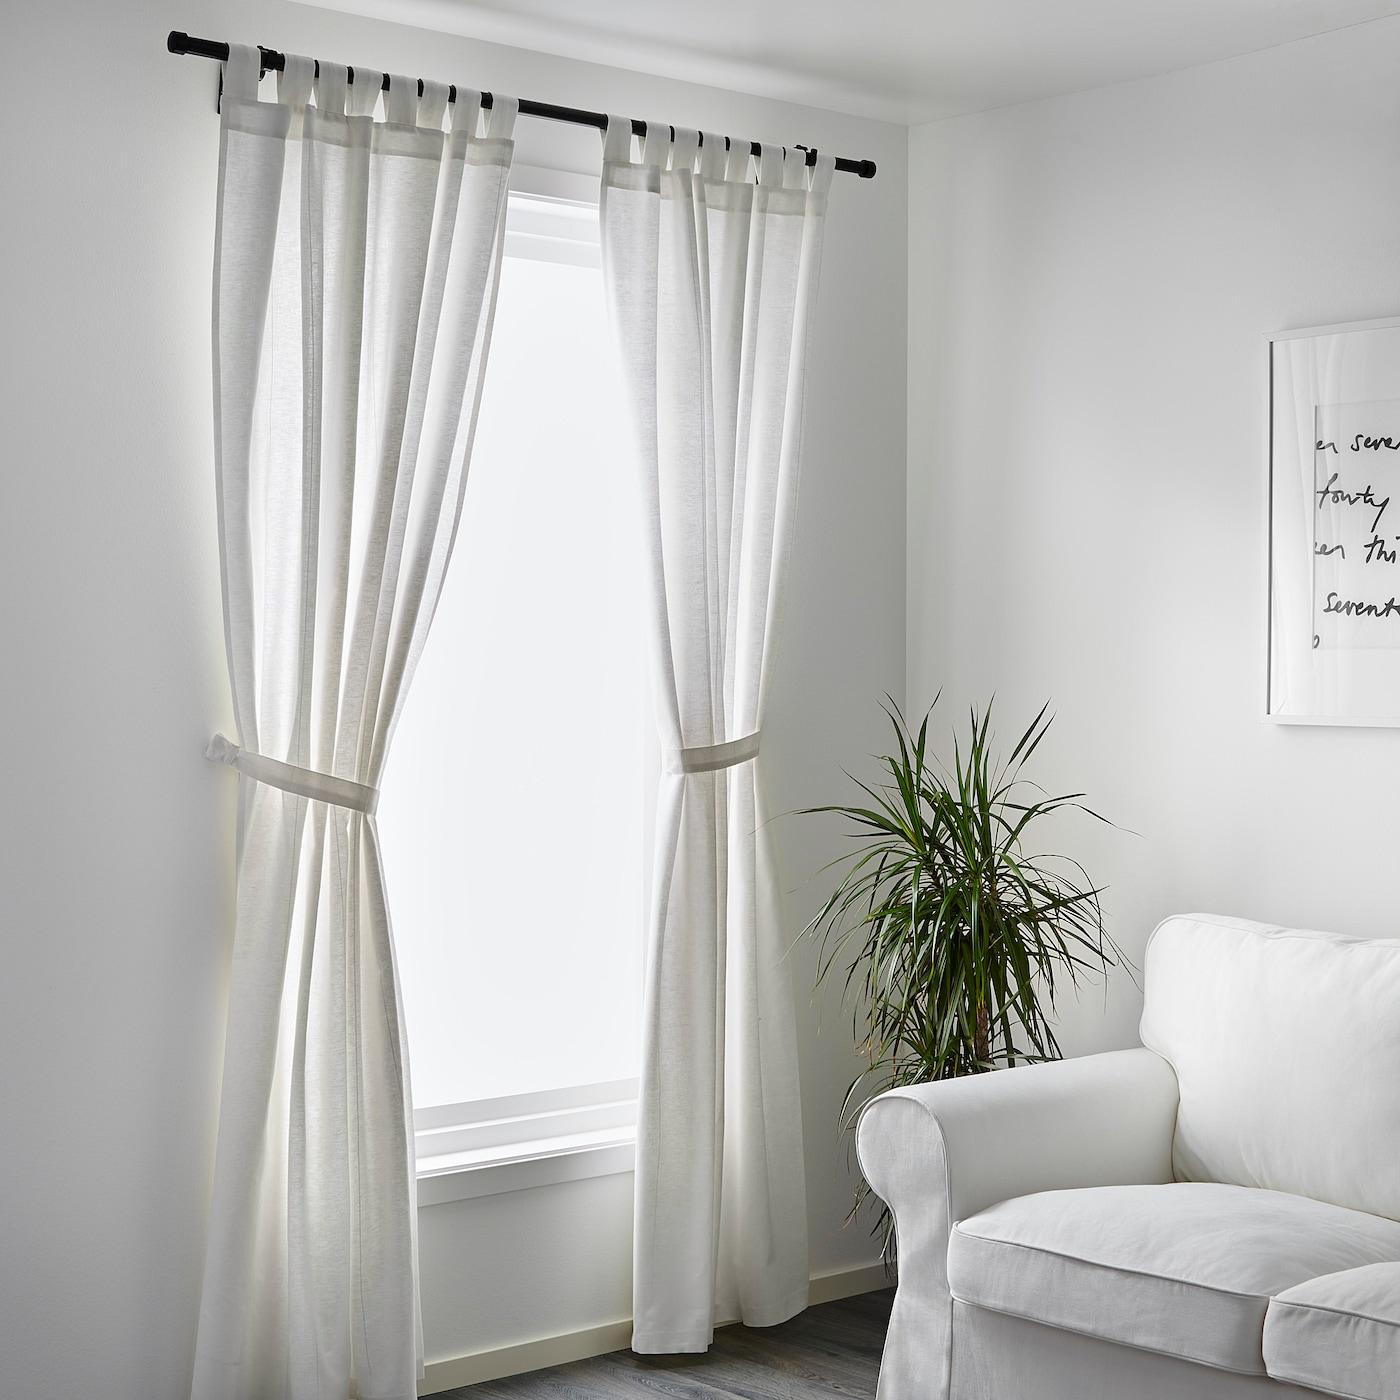 LENDA Curtains with tie-backs, 14 pair - white 1440x14 cm